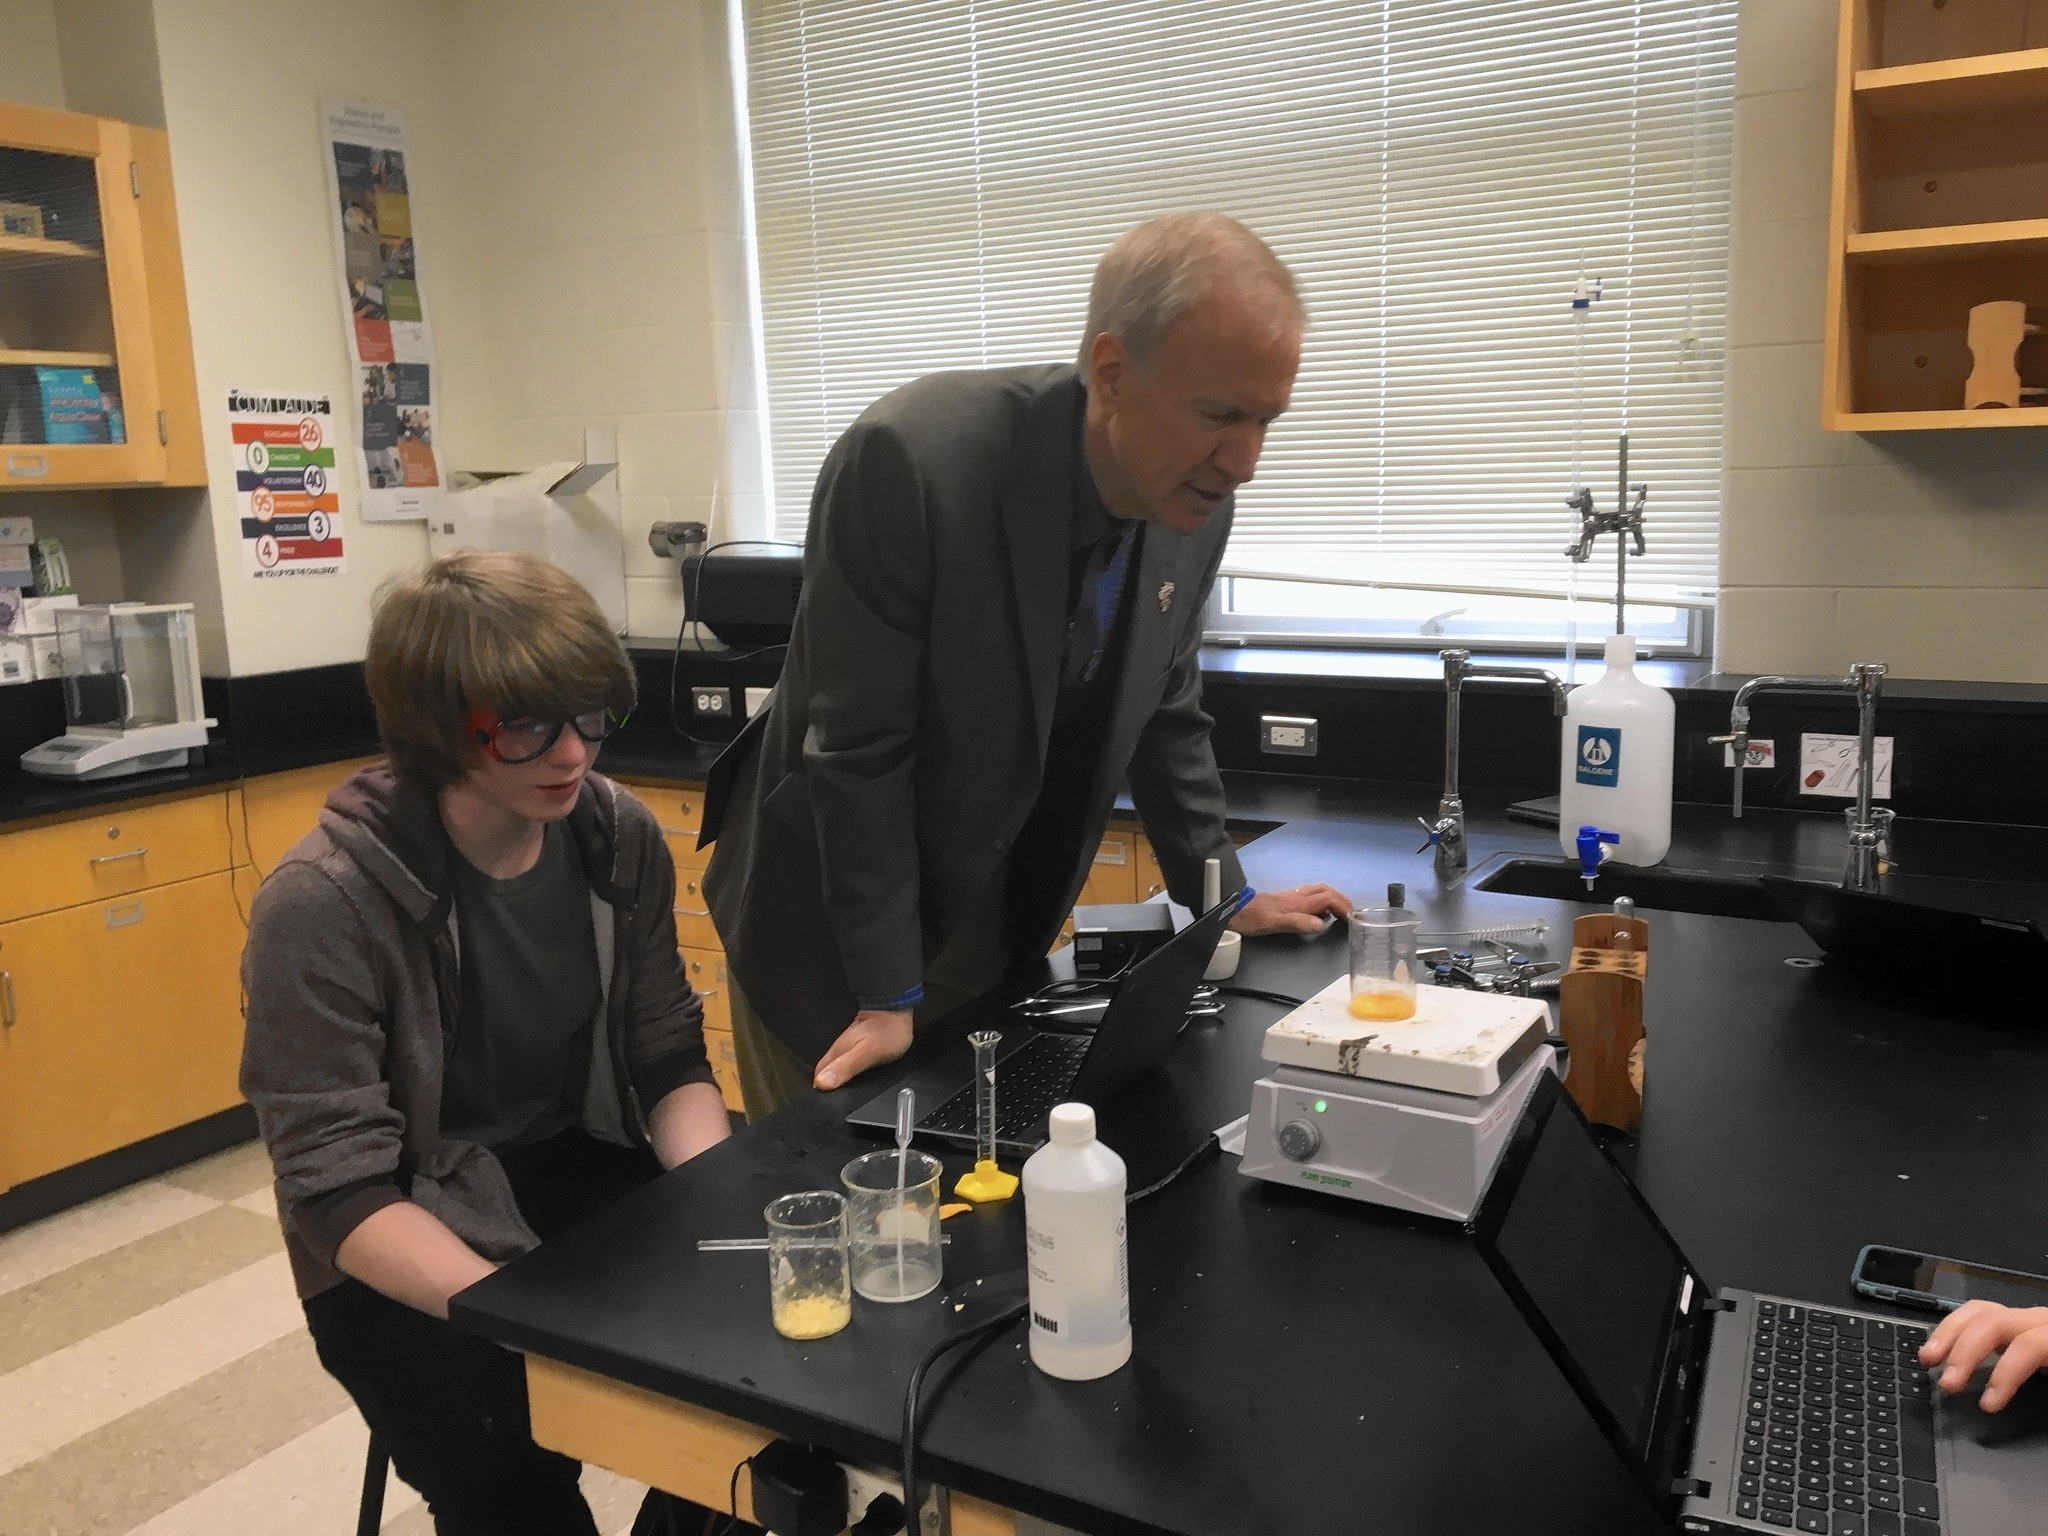 Lakes High School students quiz Rauner on budget, medical marijuana